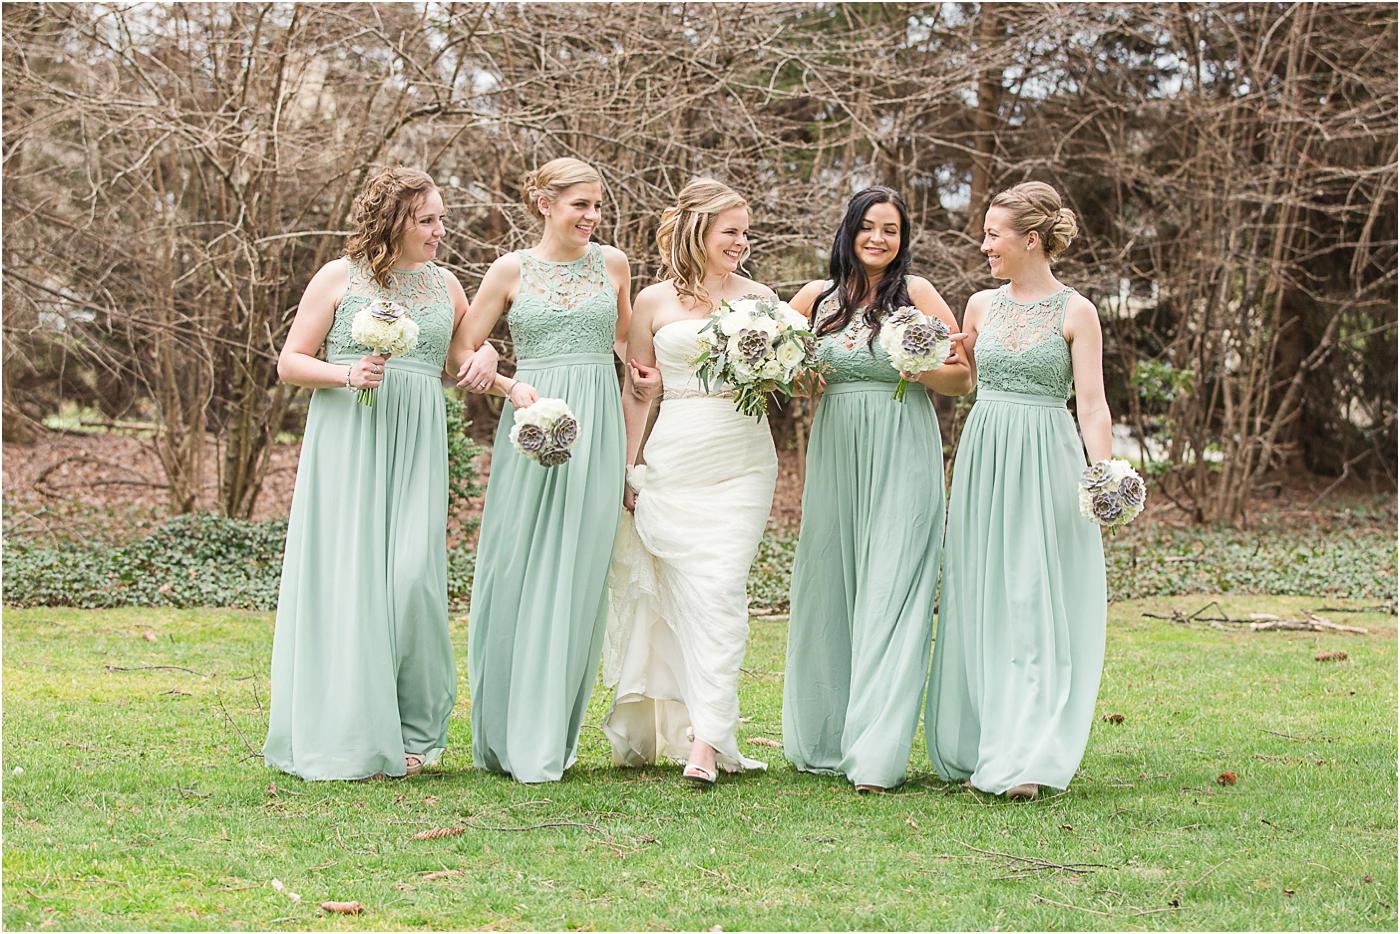 Greyrock-mansion-wedding-73.jpg